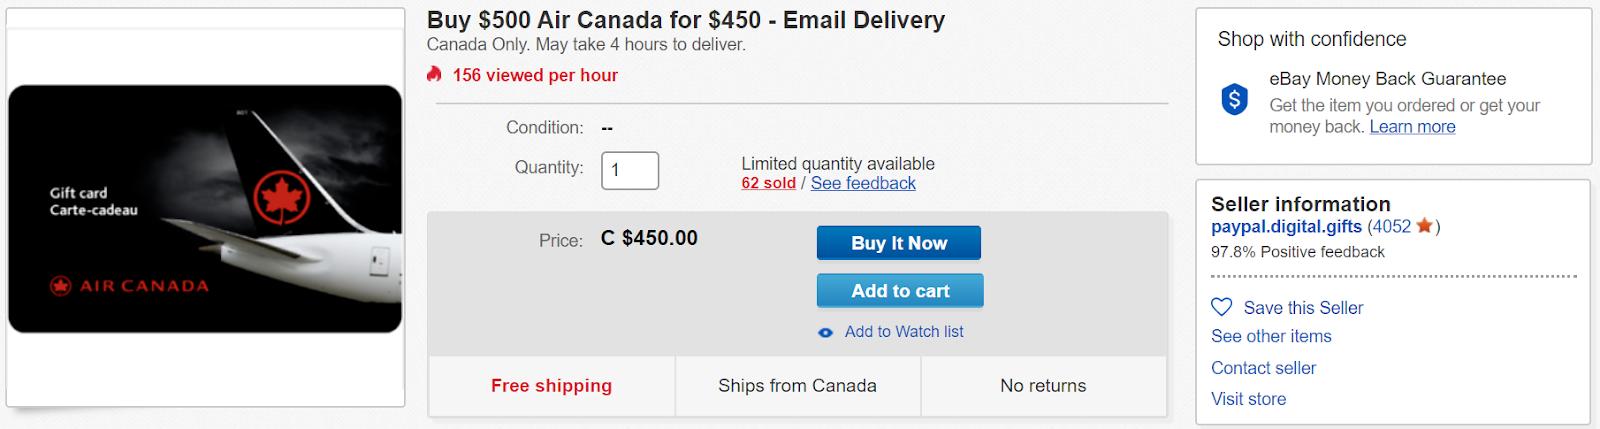 Canadian Rewards Ebay Buy 500 Air Canada Egift Card For 450 Expired